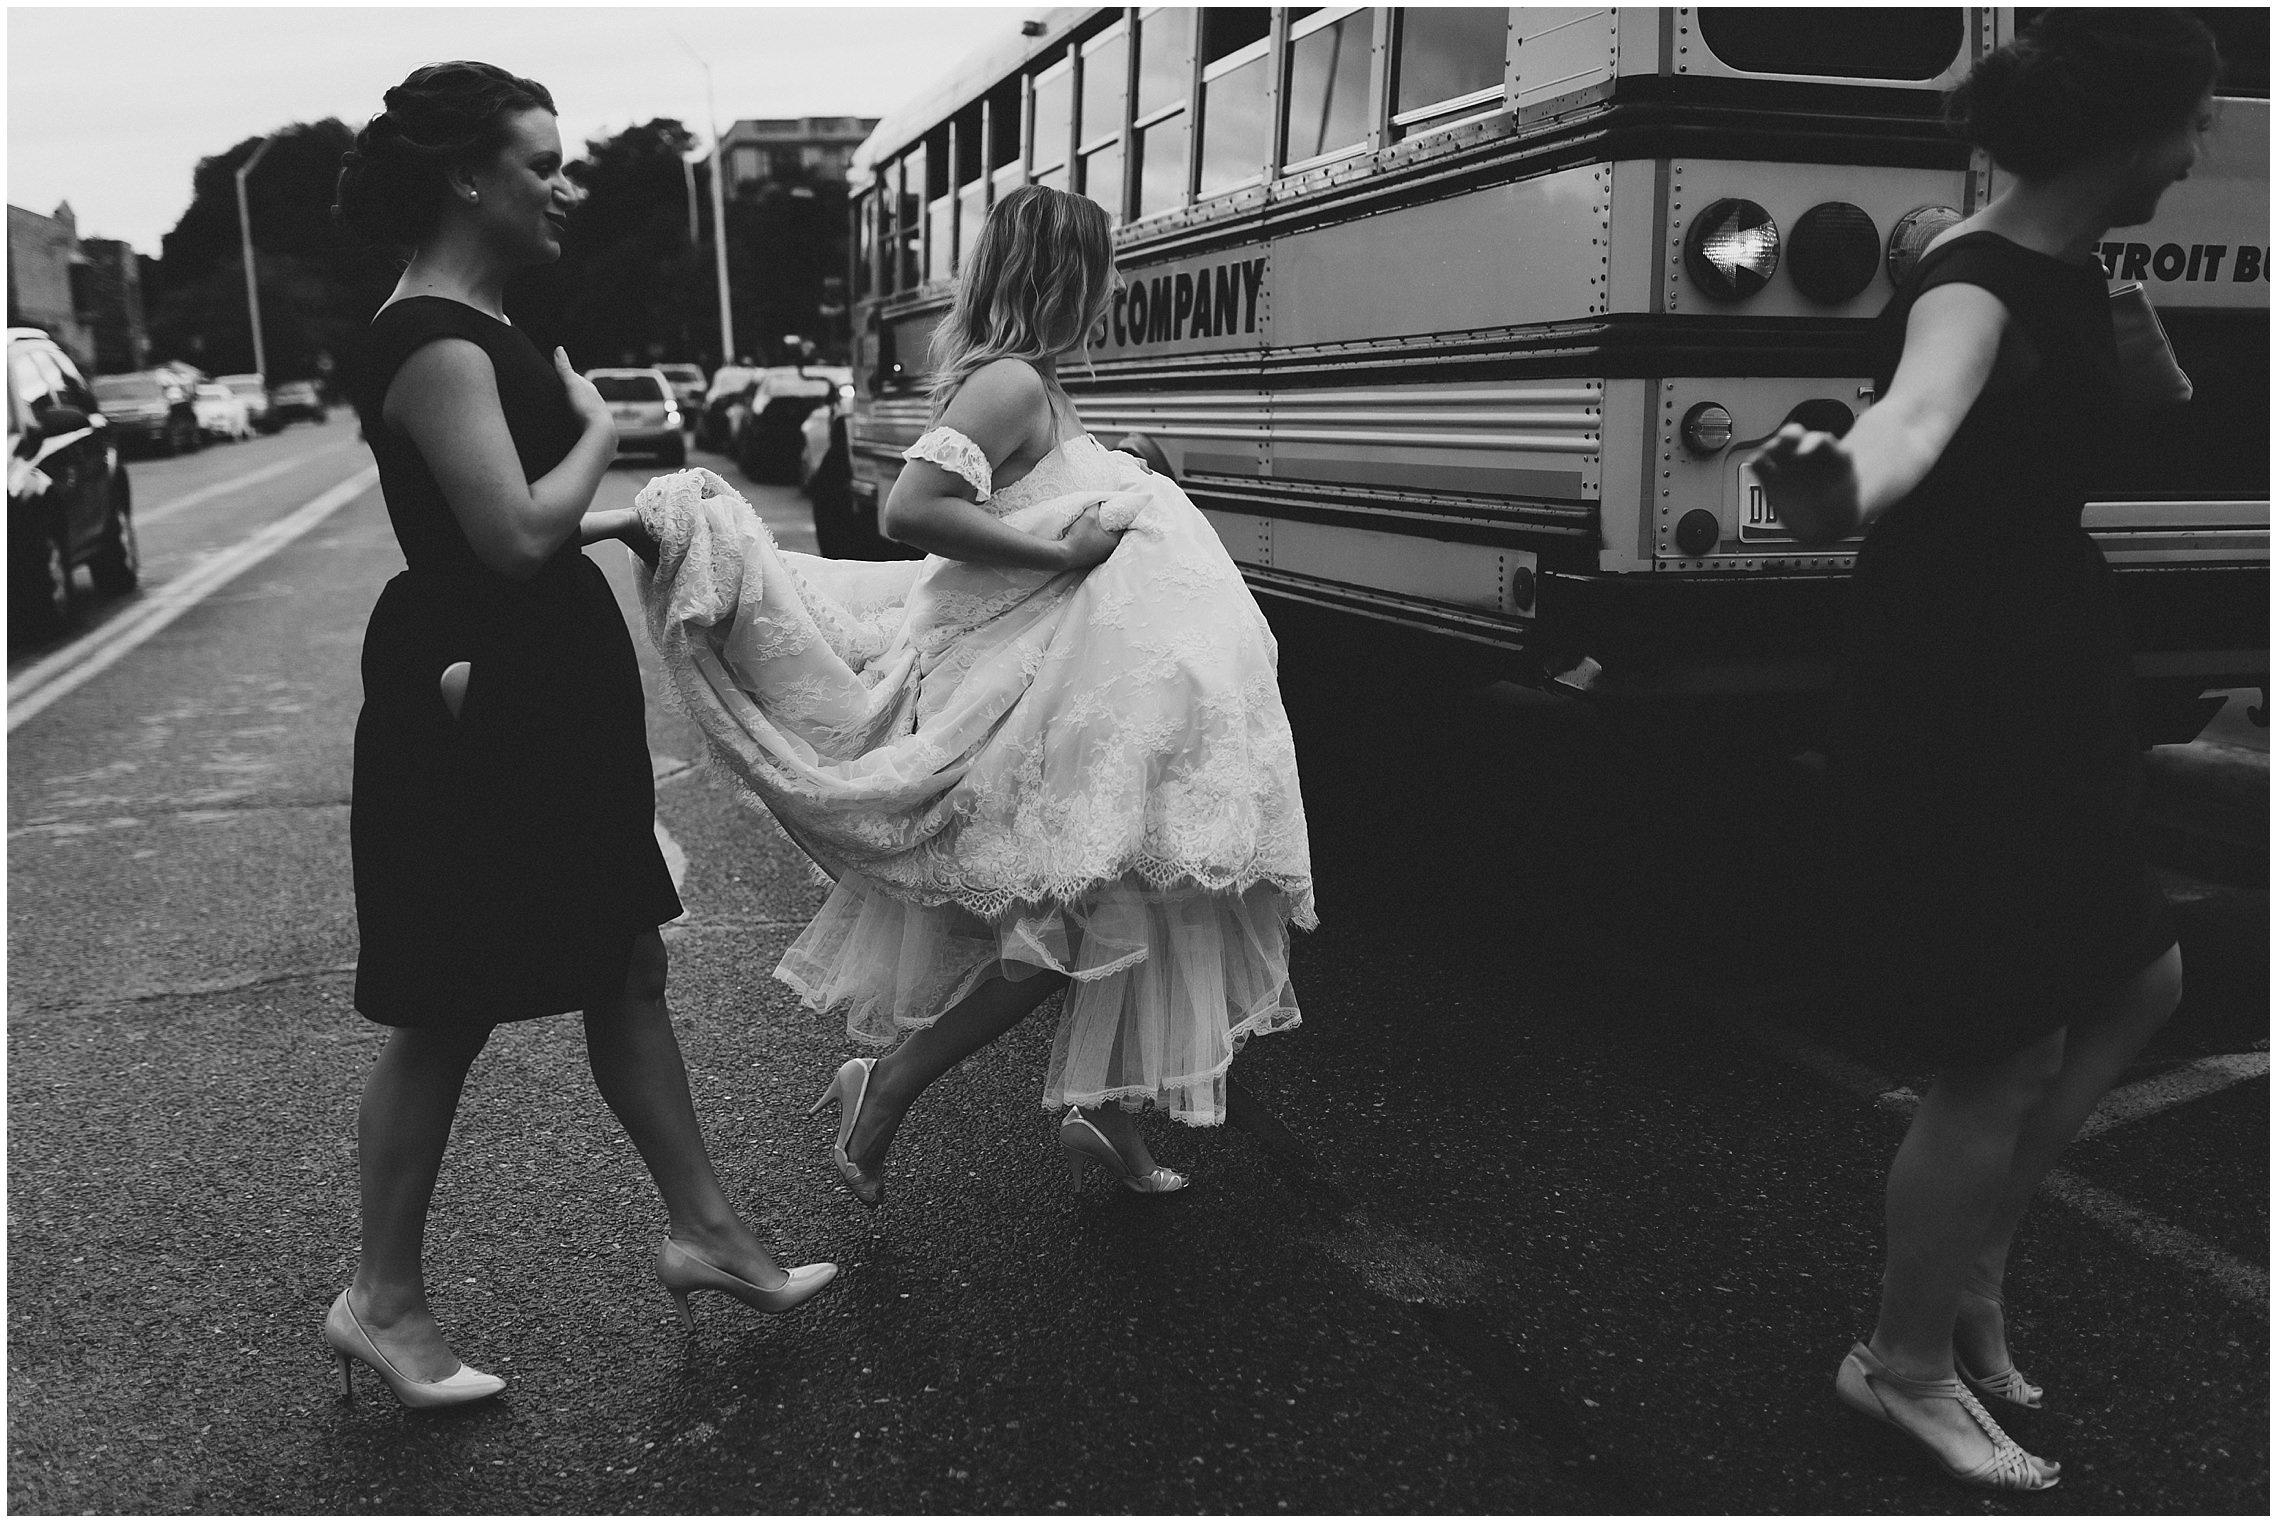 brick_and_mortar_colorado_wedding_photographer_0251.jpg